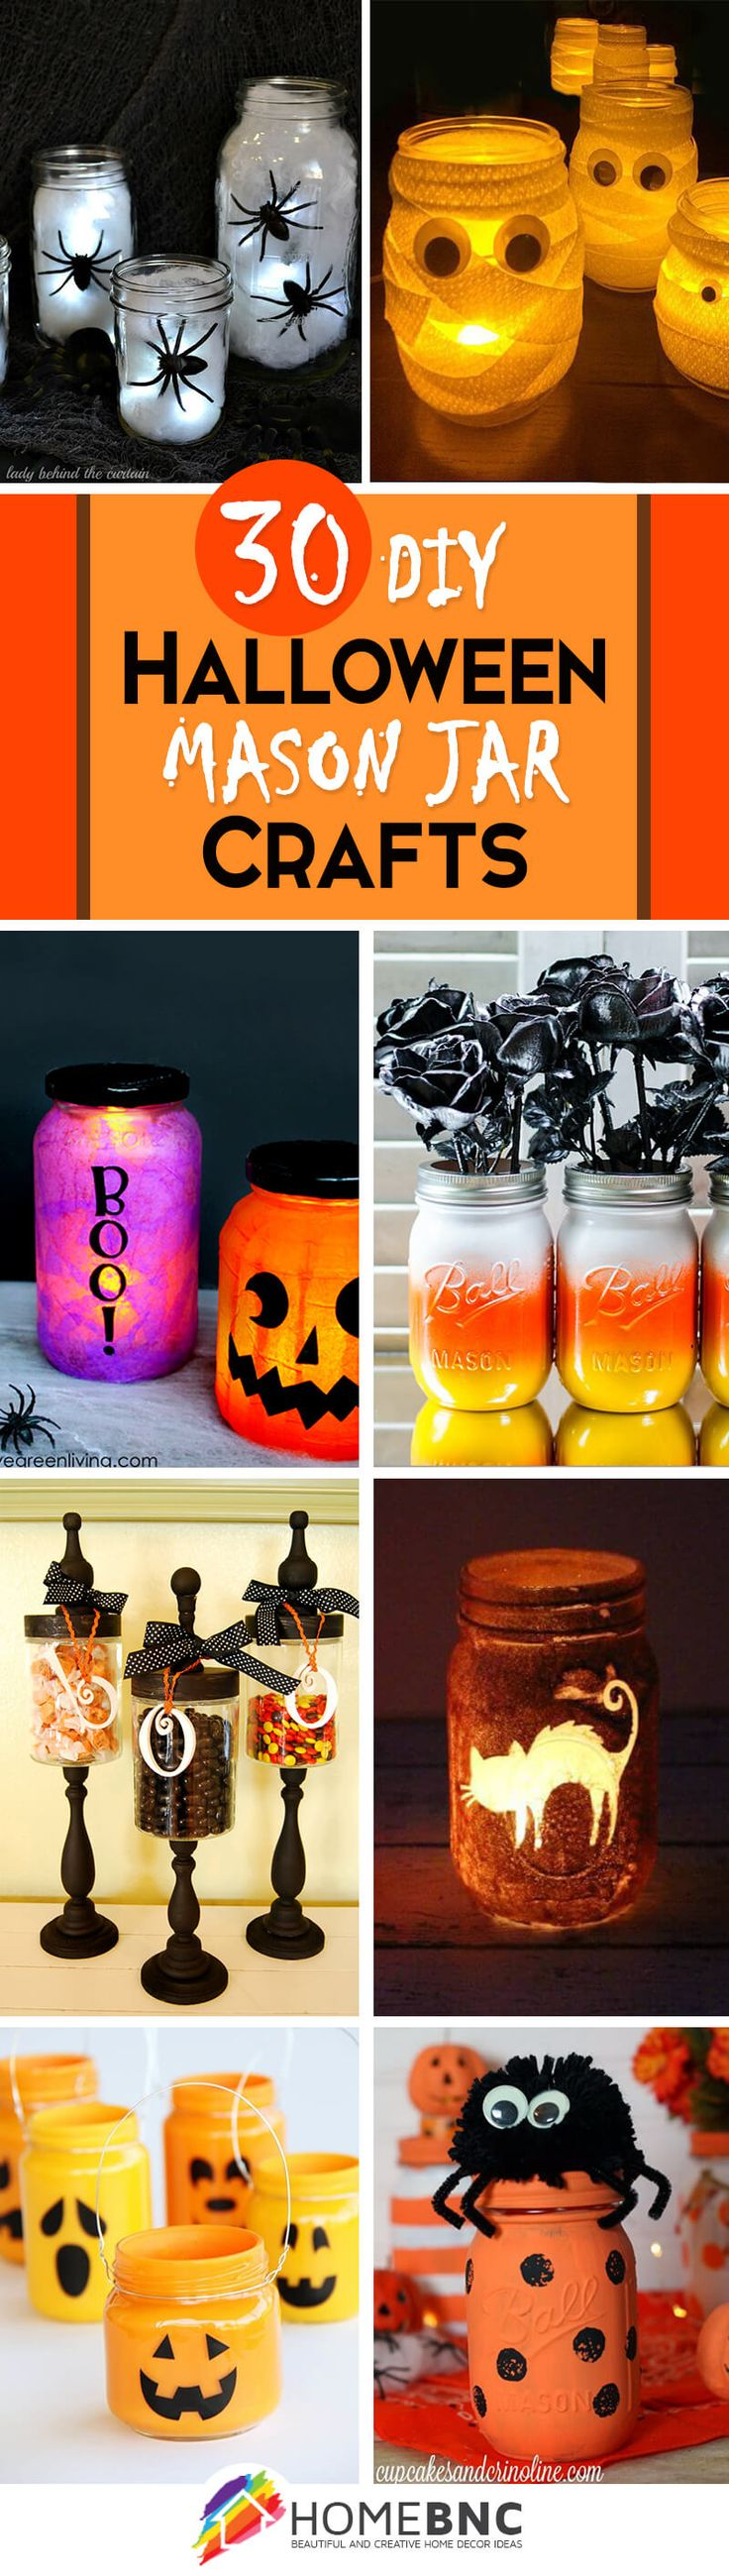 DIY Mason Jar Halloween Craft Ideas